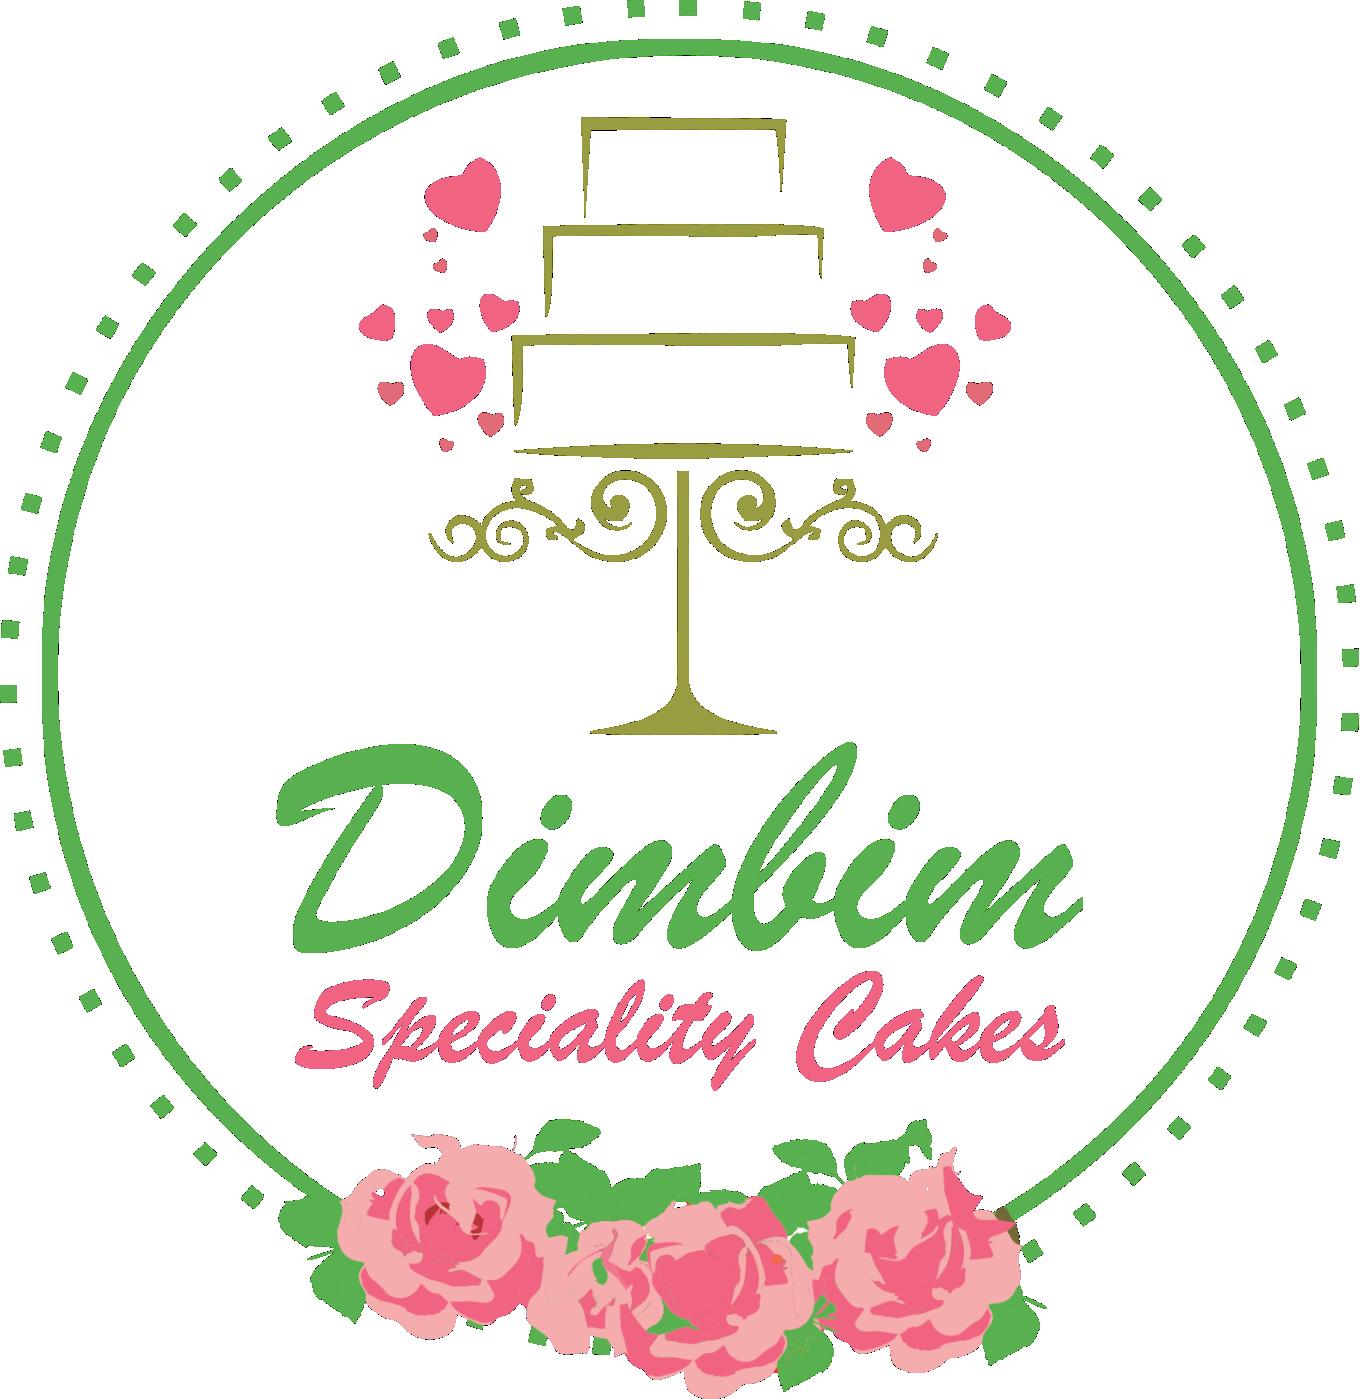 Dimbim Speciality Cakes